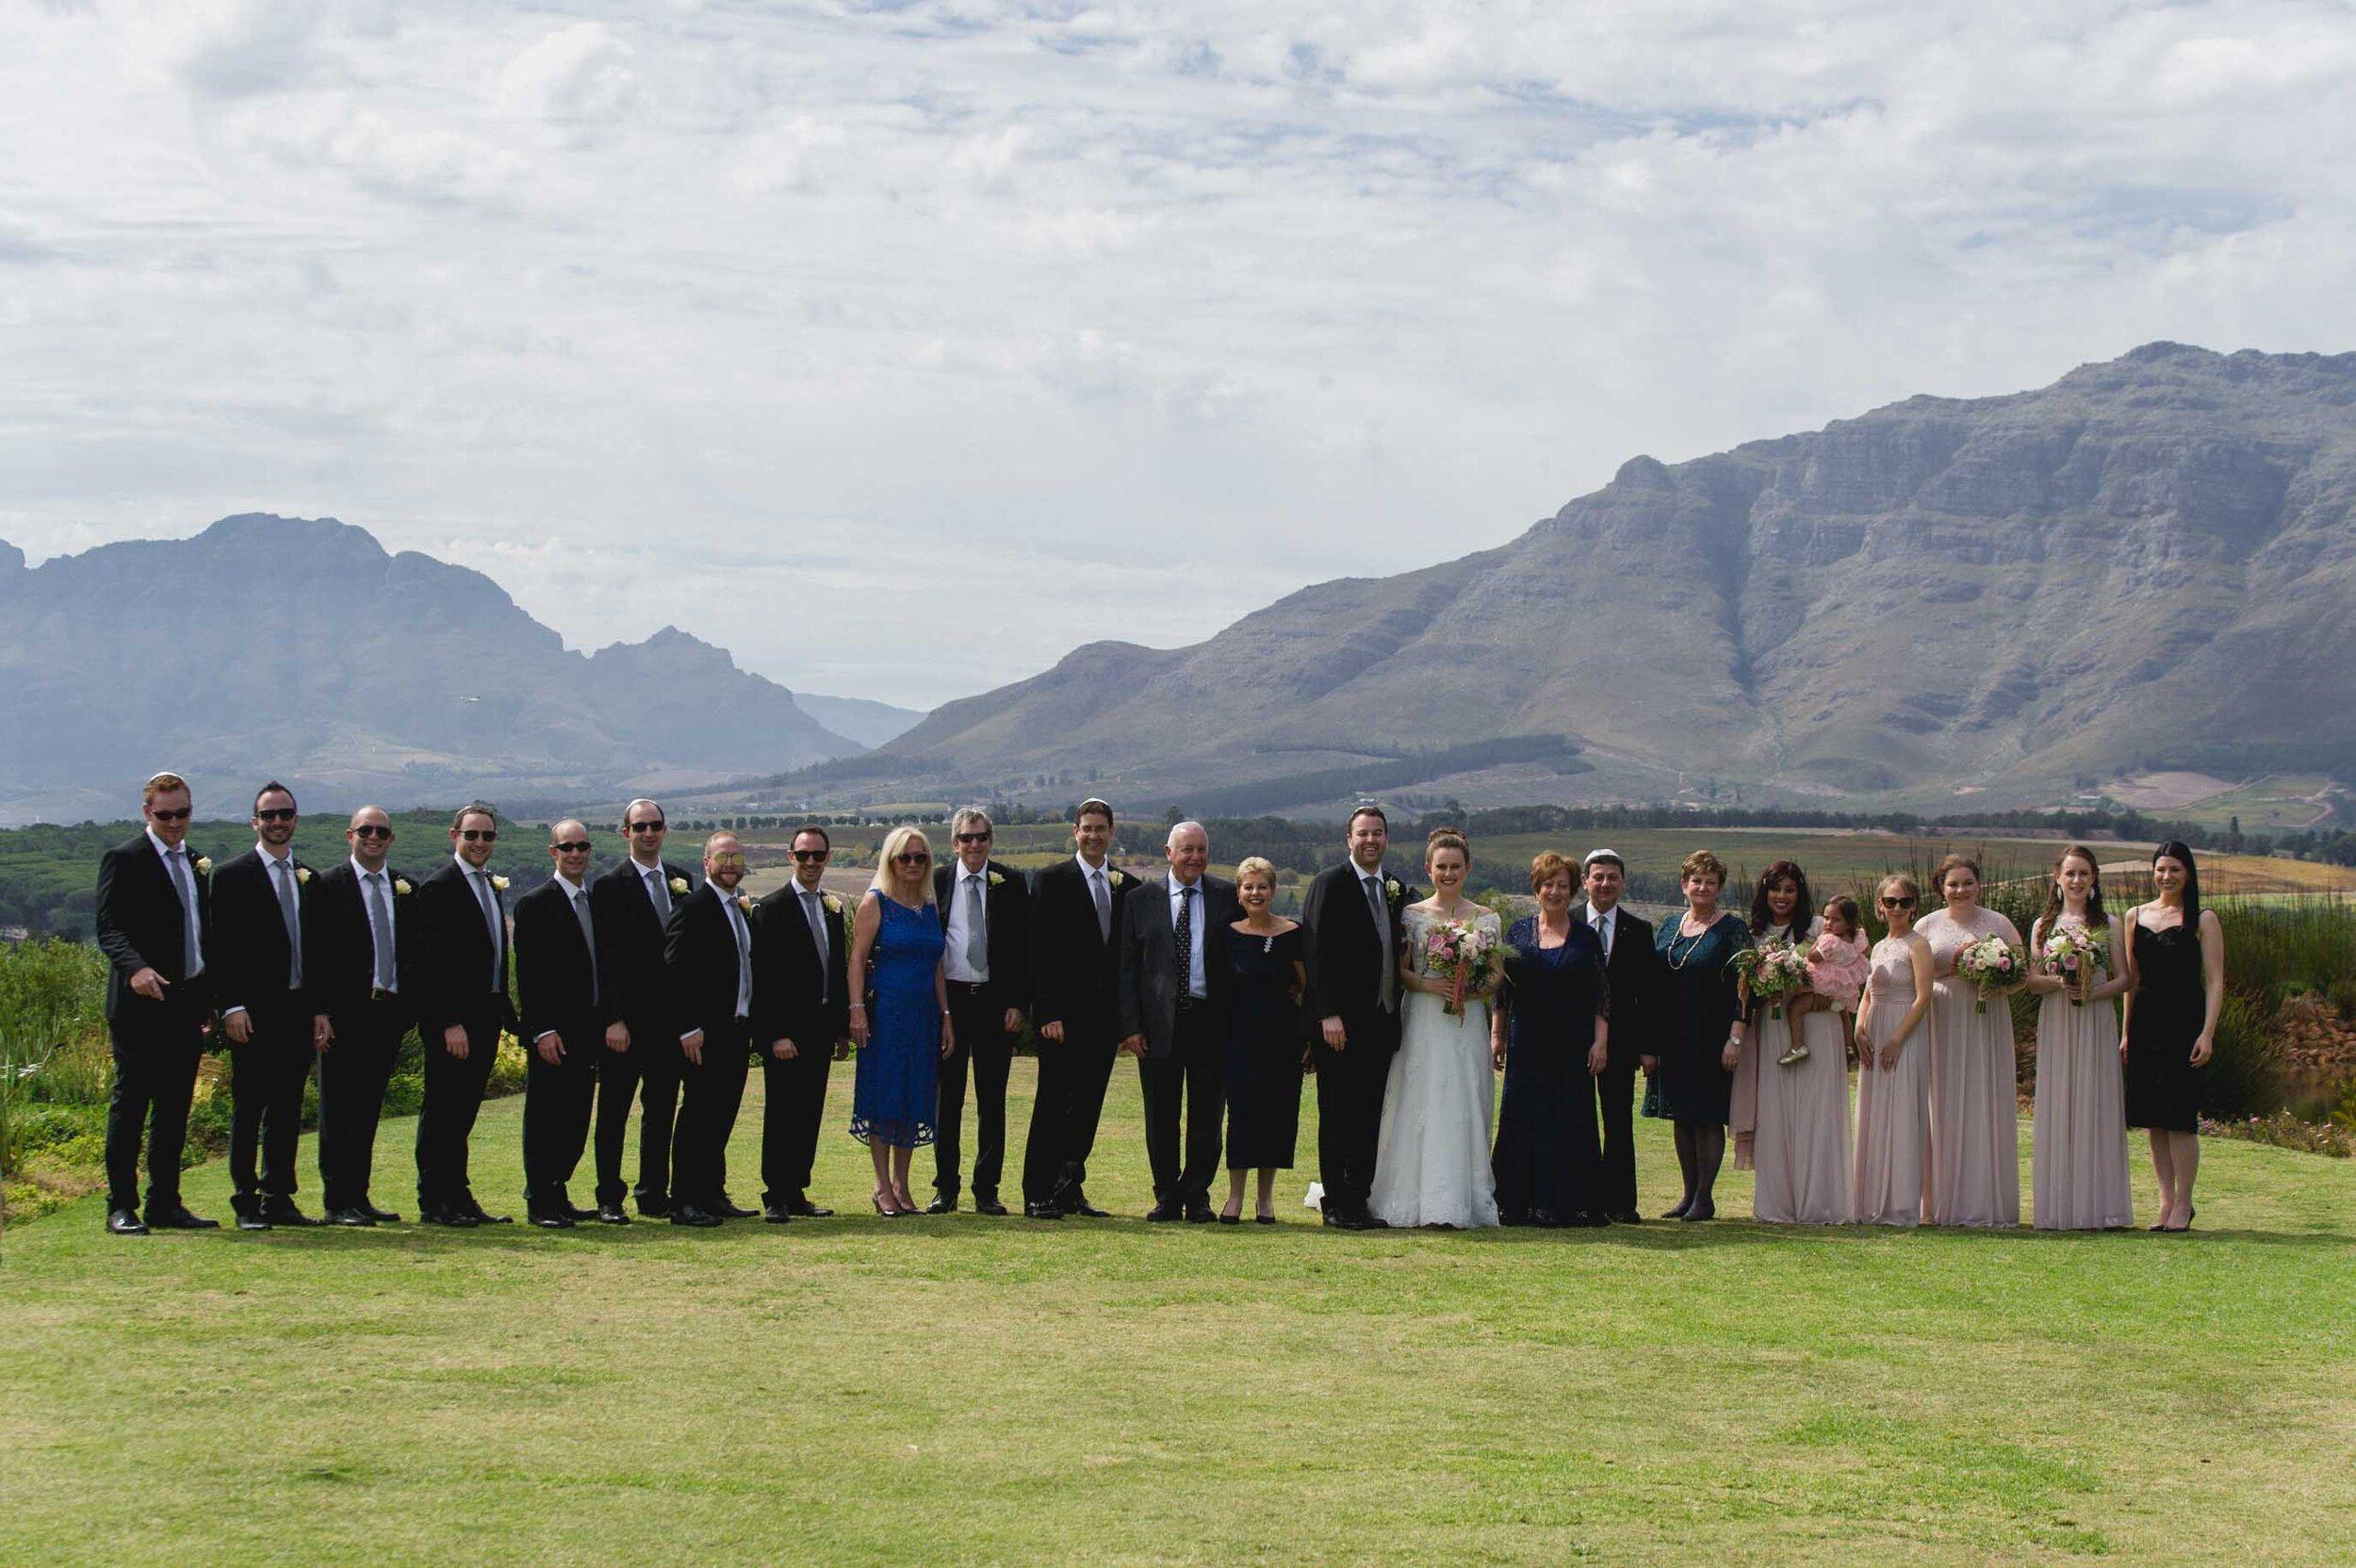 john-henry-wedding-photographer-bride001-10.jpg